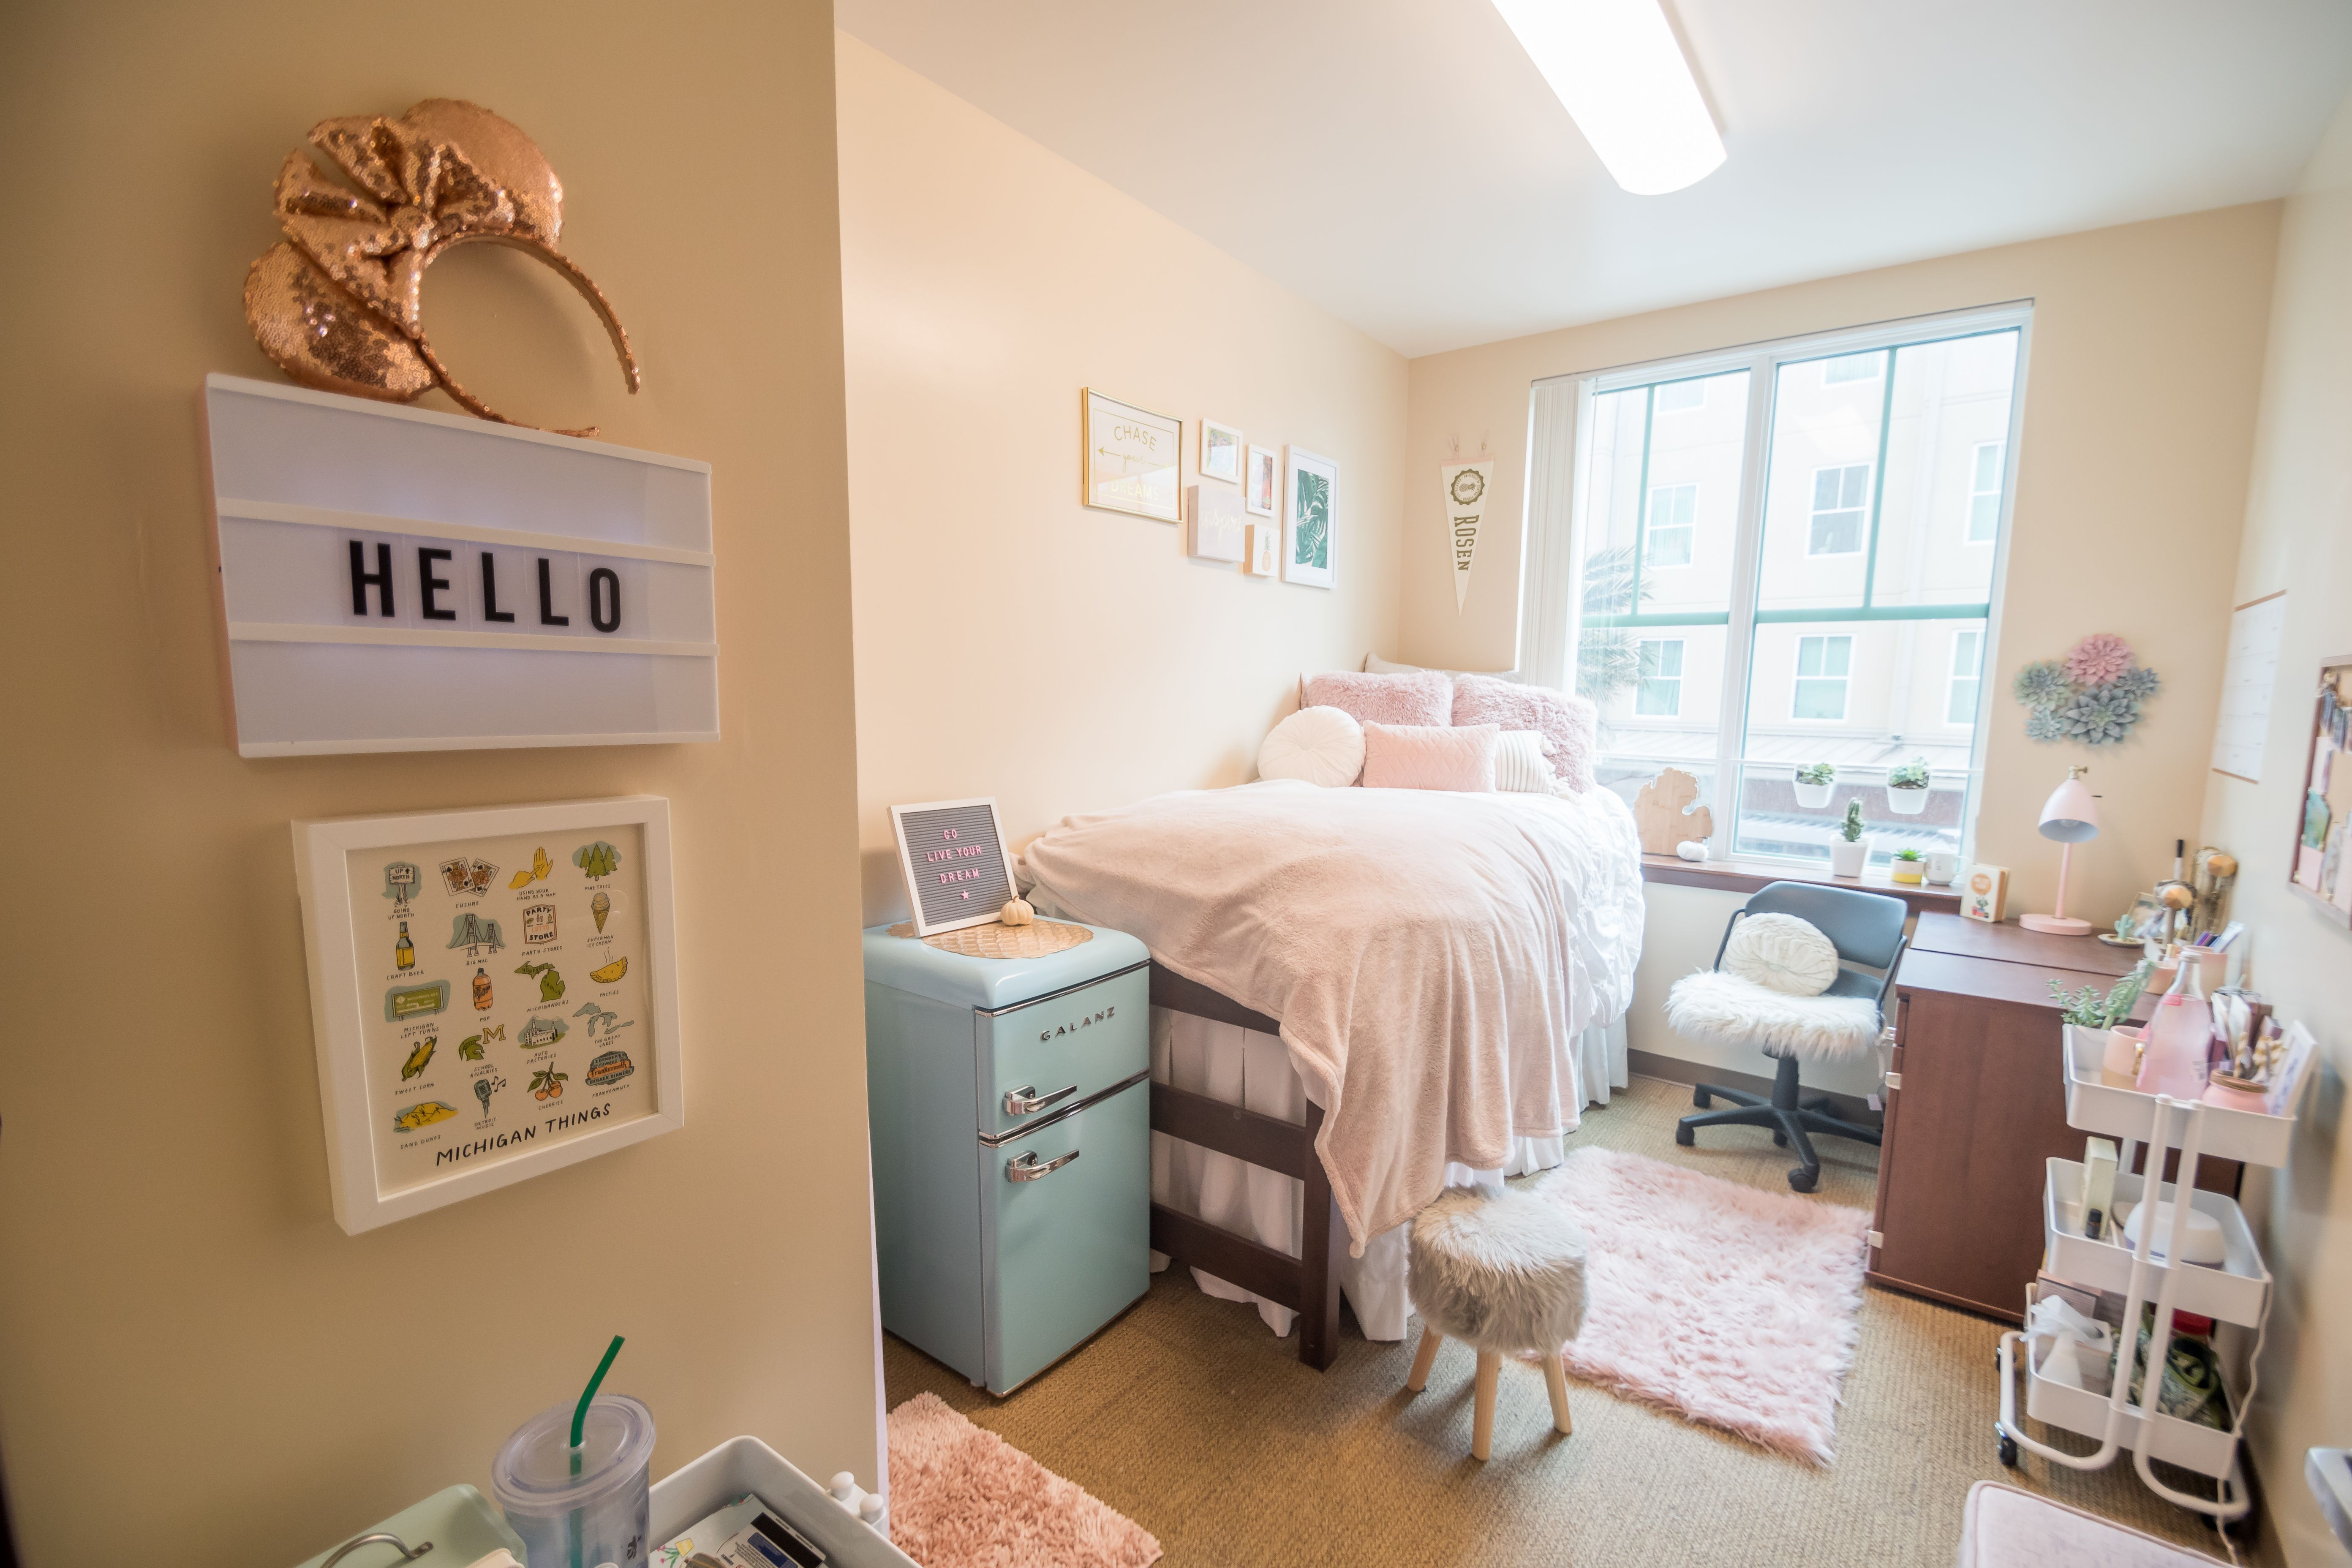 Neptune Room Dorm Inspiration Dorm Room Designs Dorm Living